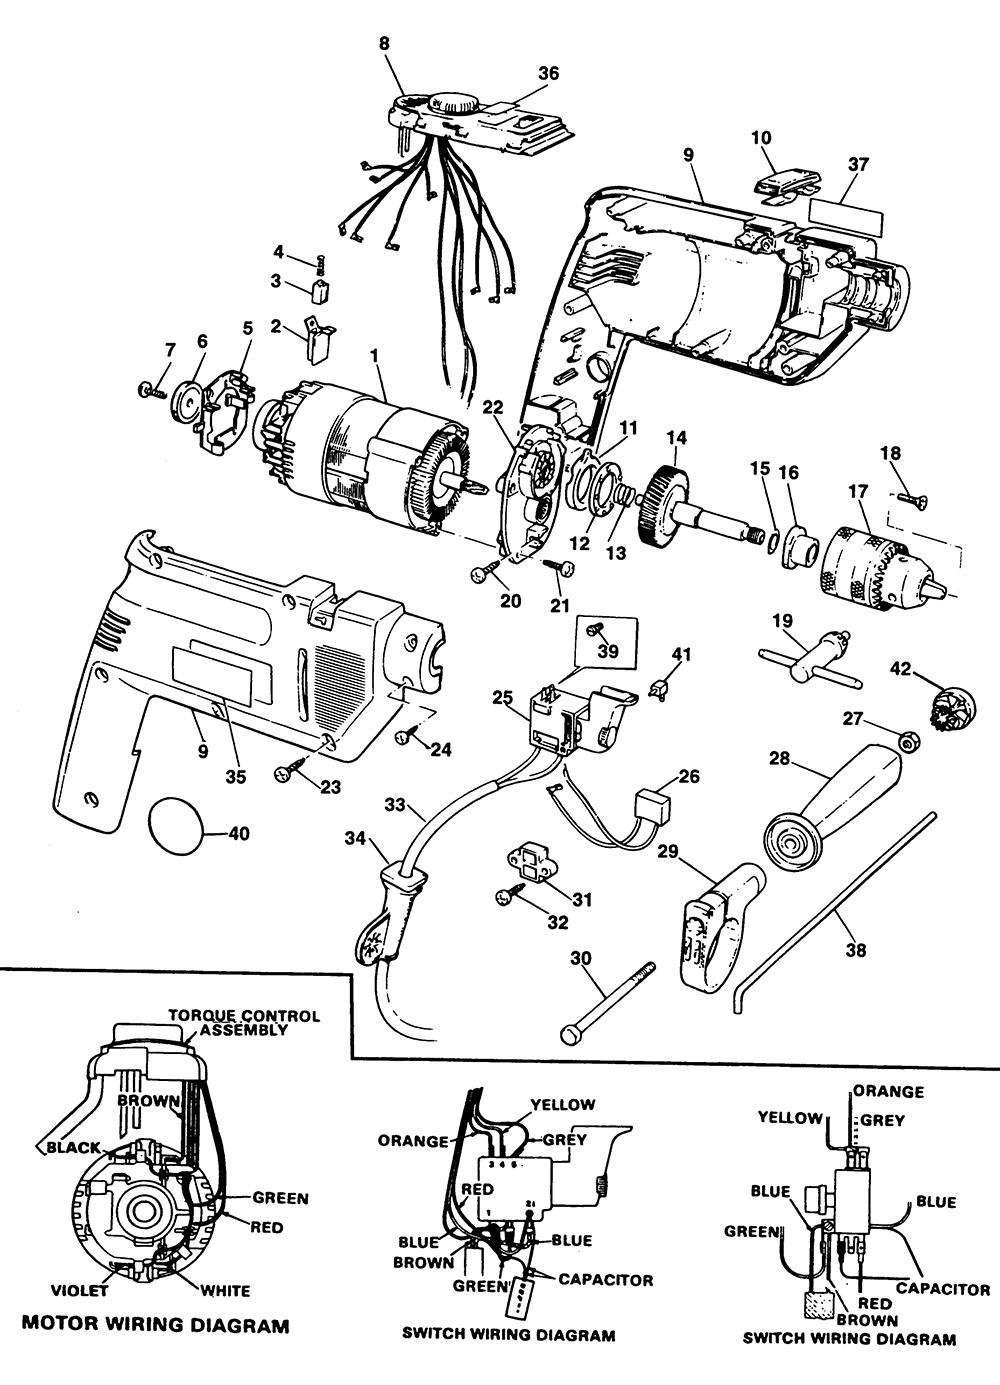 Black & Decker BD155RT Type 1 Hammer Drill Spare Parts